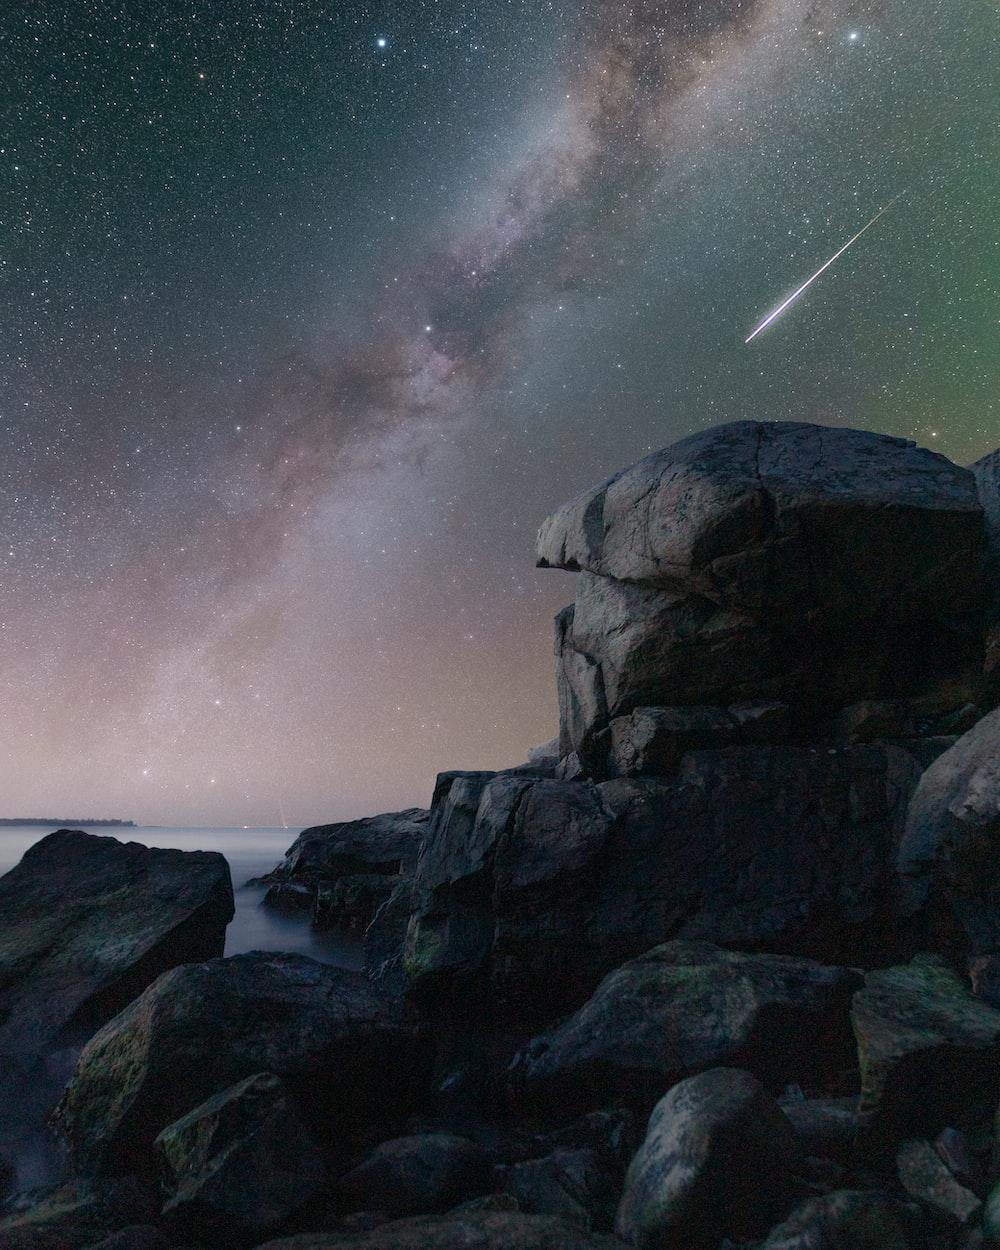 rocky mountain under starry night